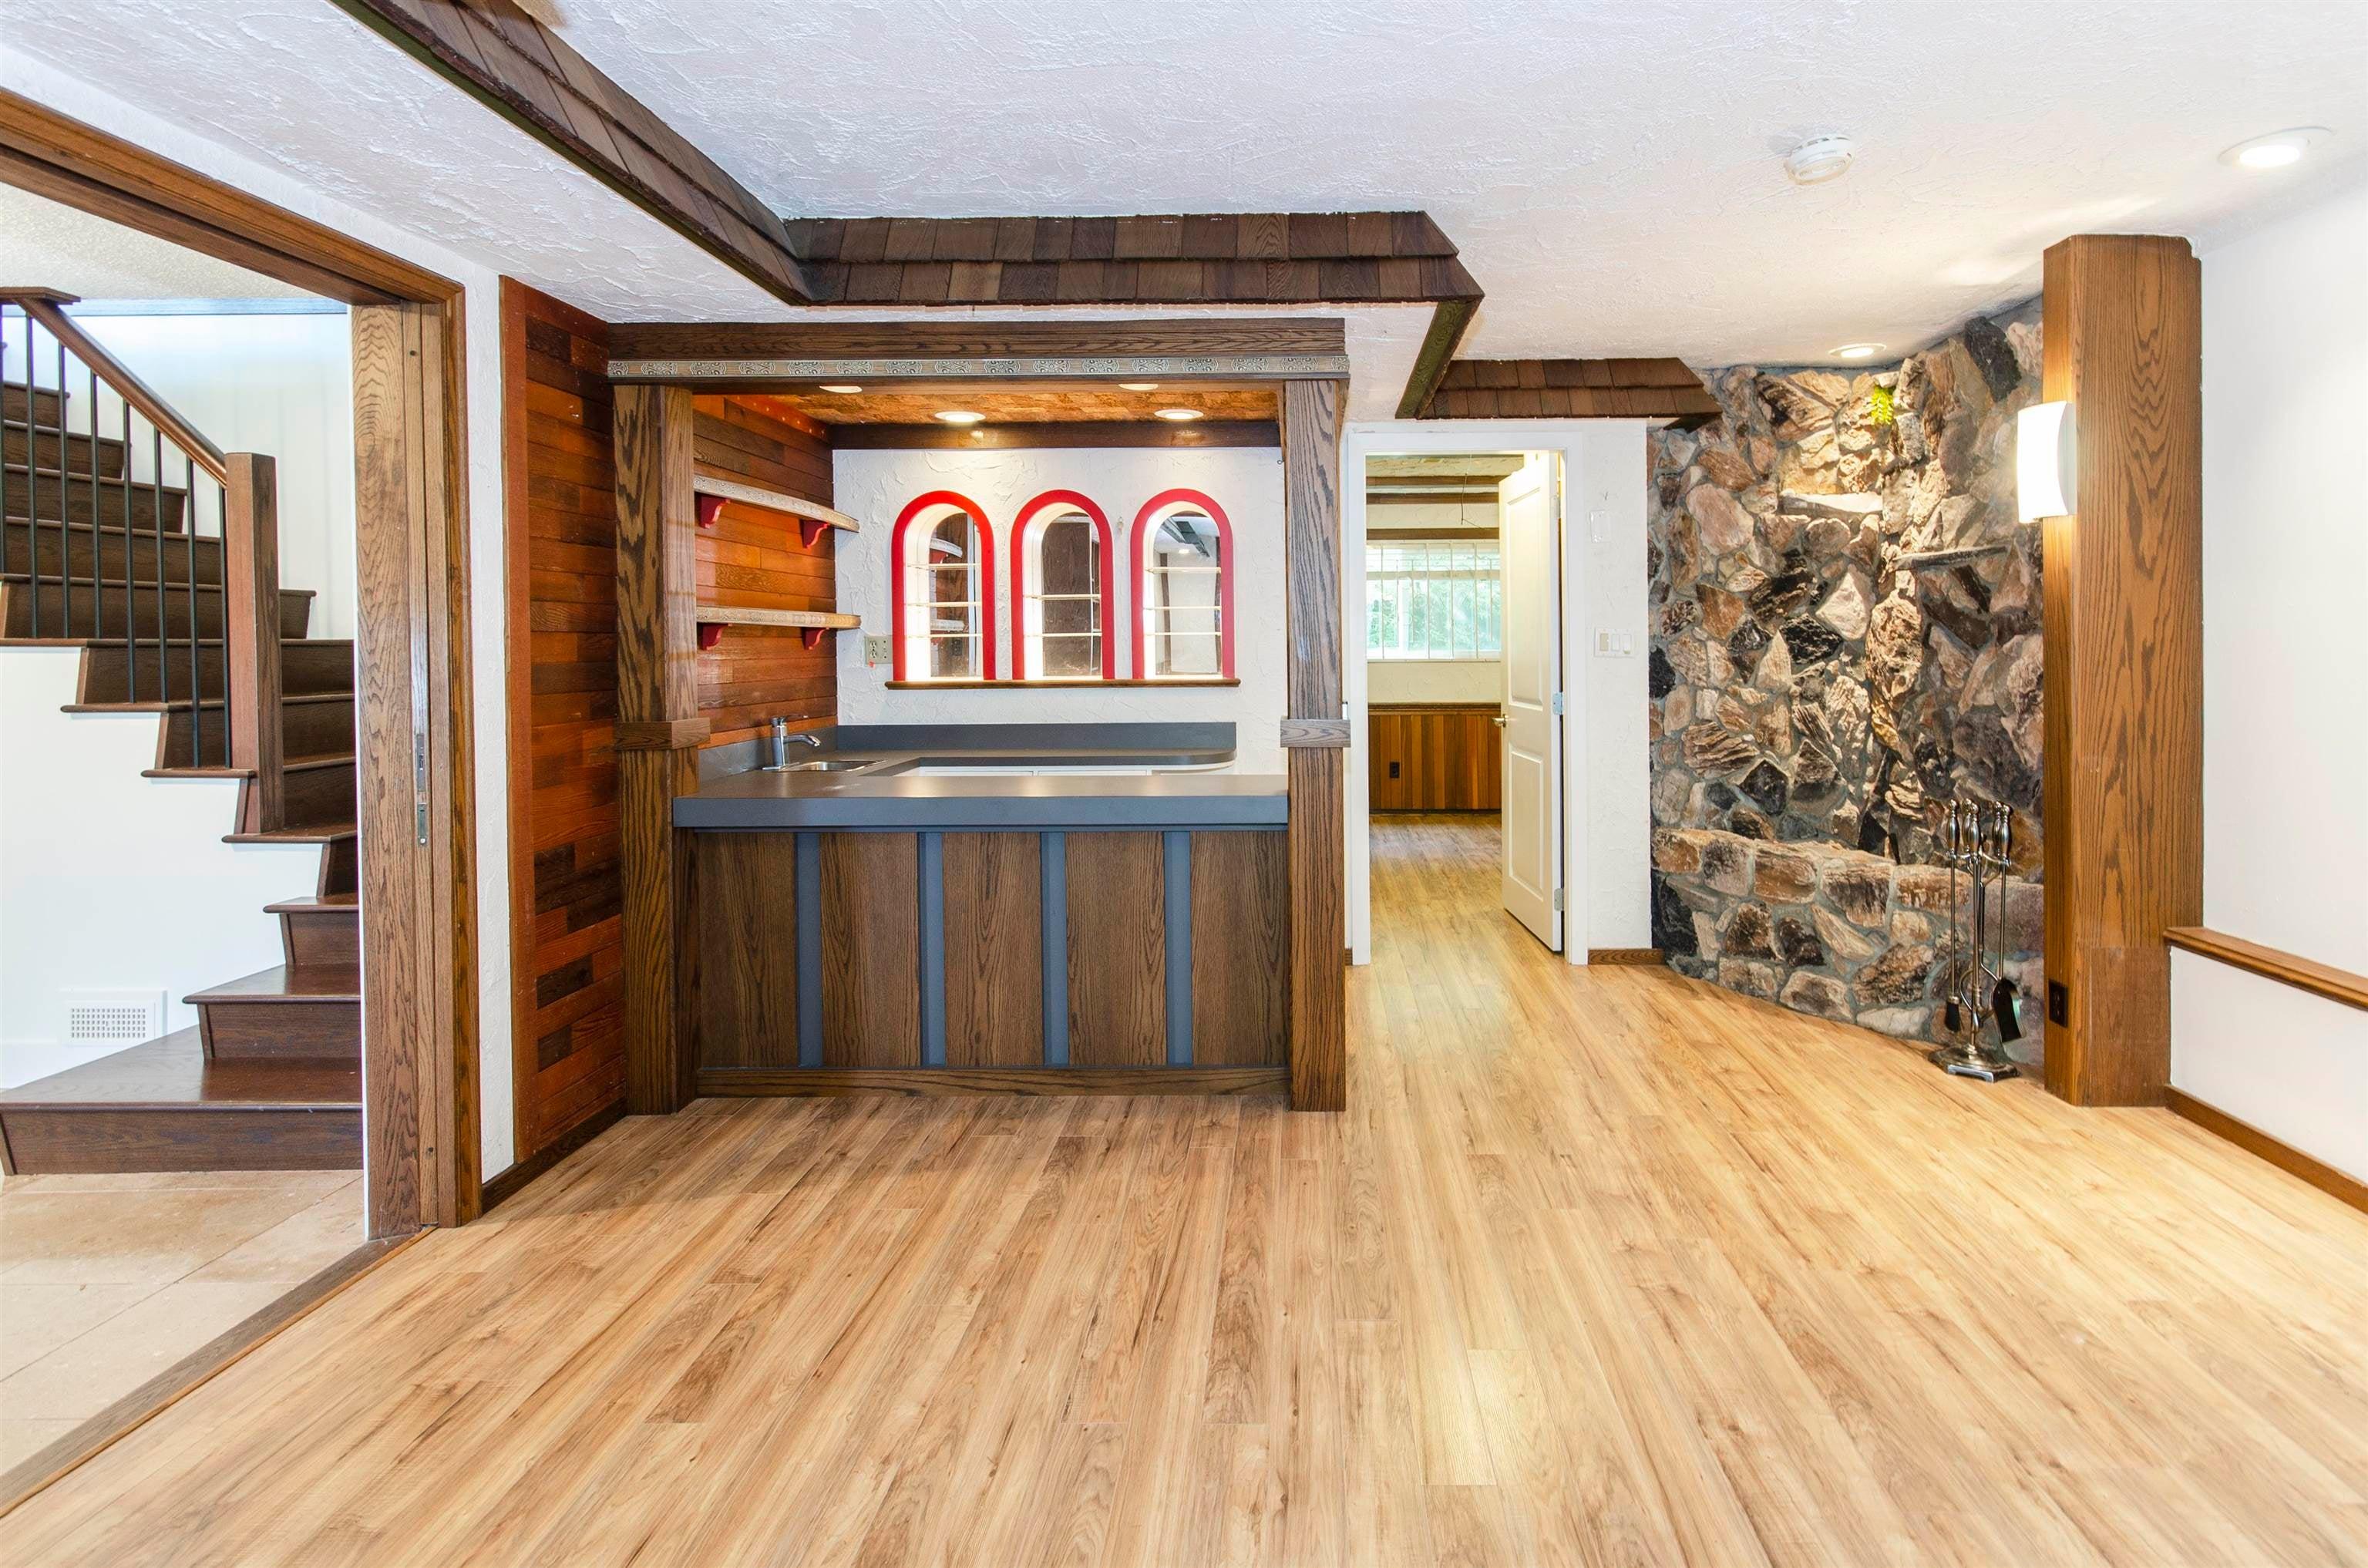 3785 REGENT AVENUE - Upper Lonsdale House/Single Family for sale, 4 Bedrooms (R2617648) - #12